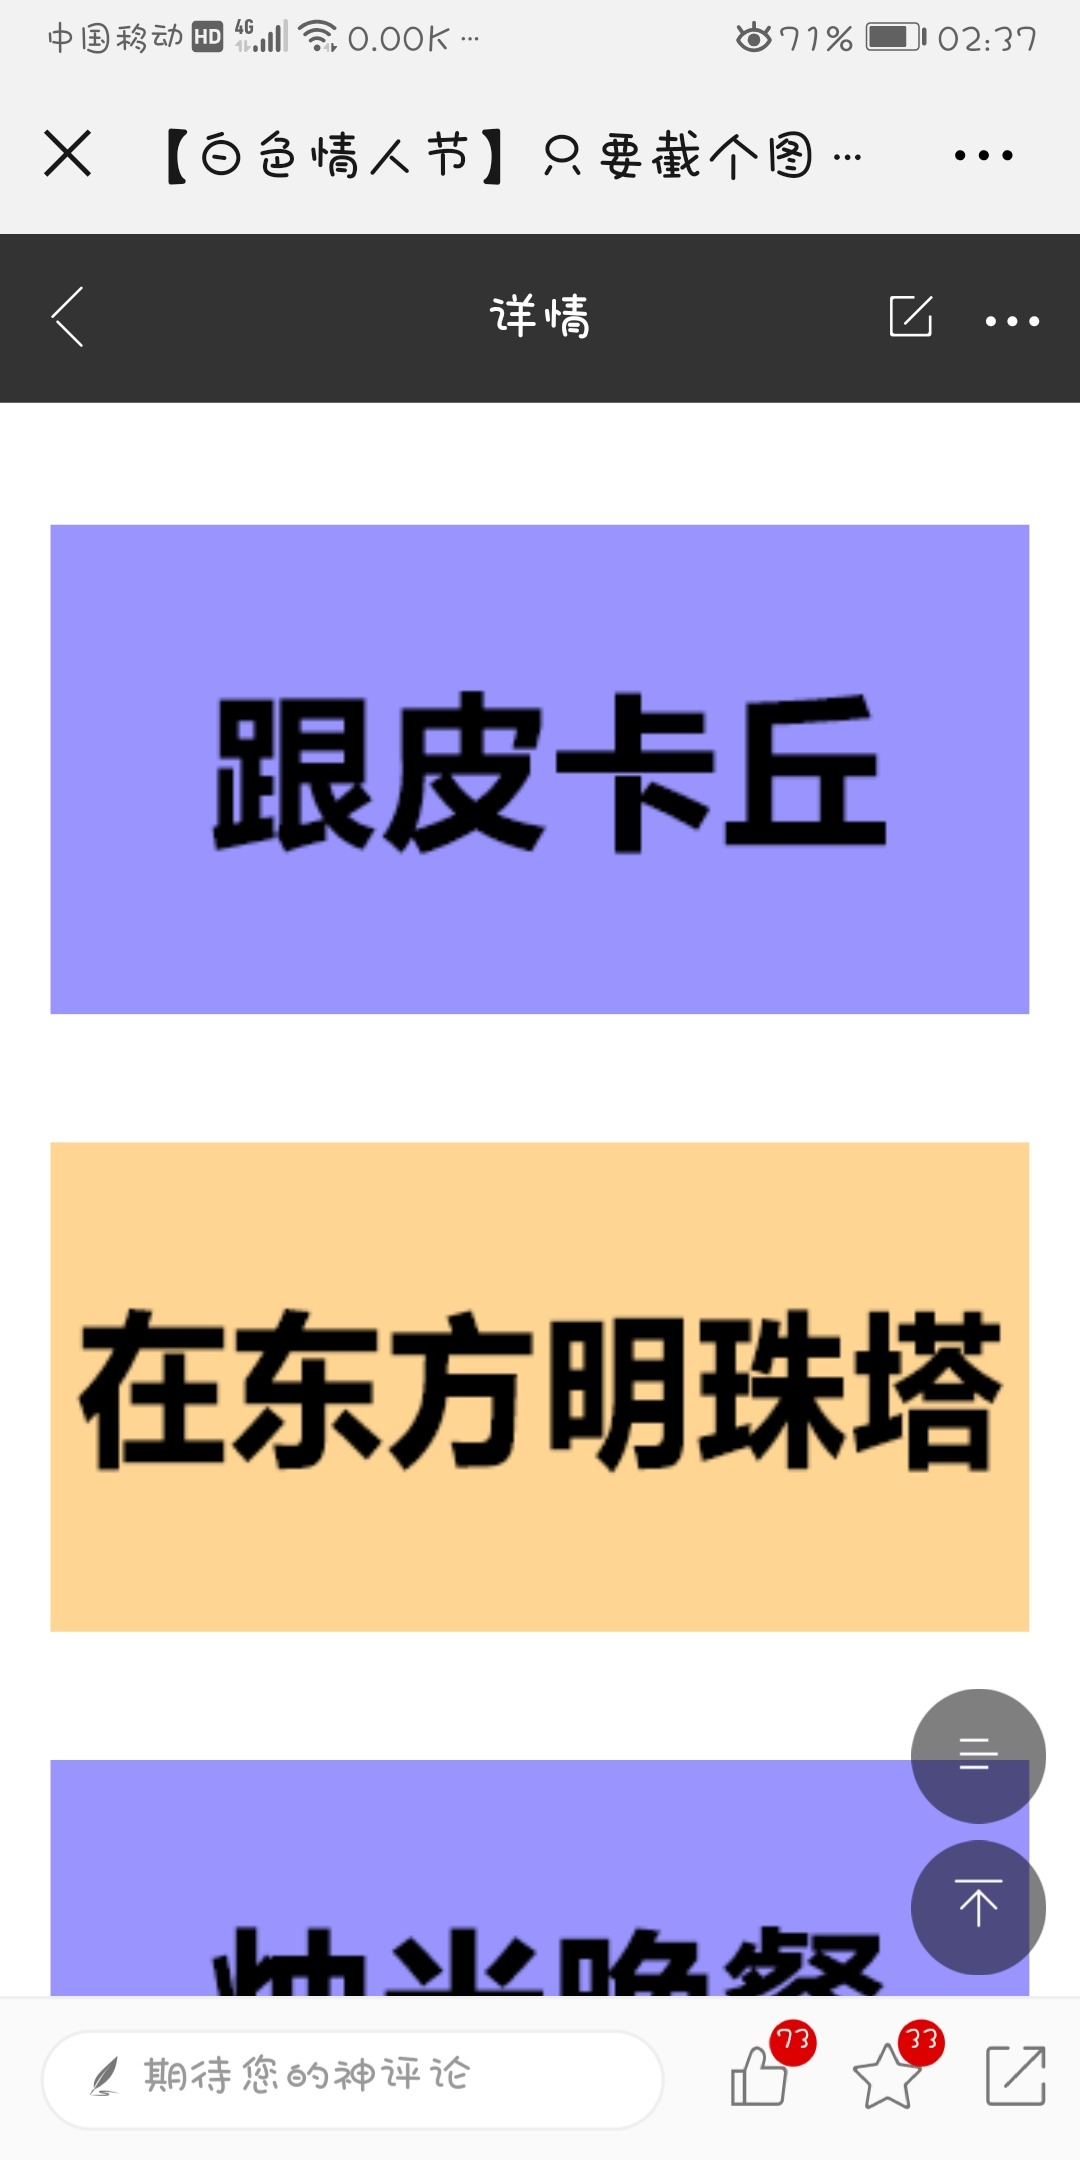 Screenshot_20190316_023710_com.tencent.mm.jpg